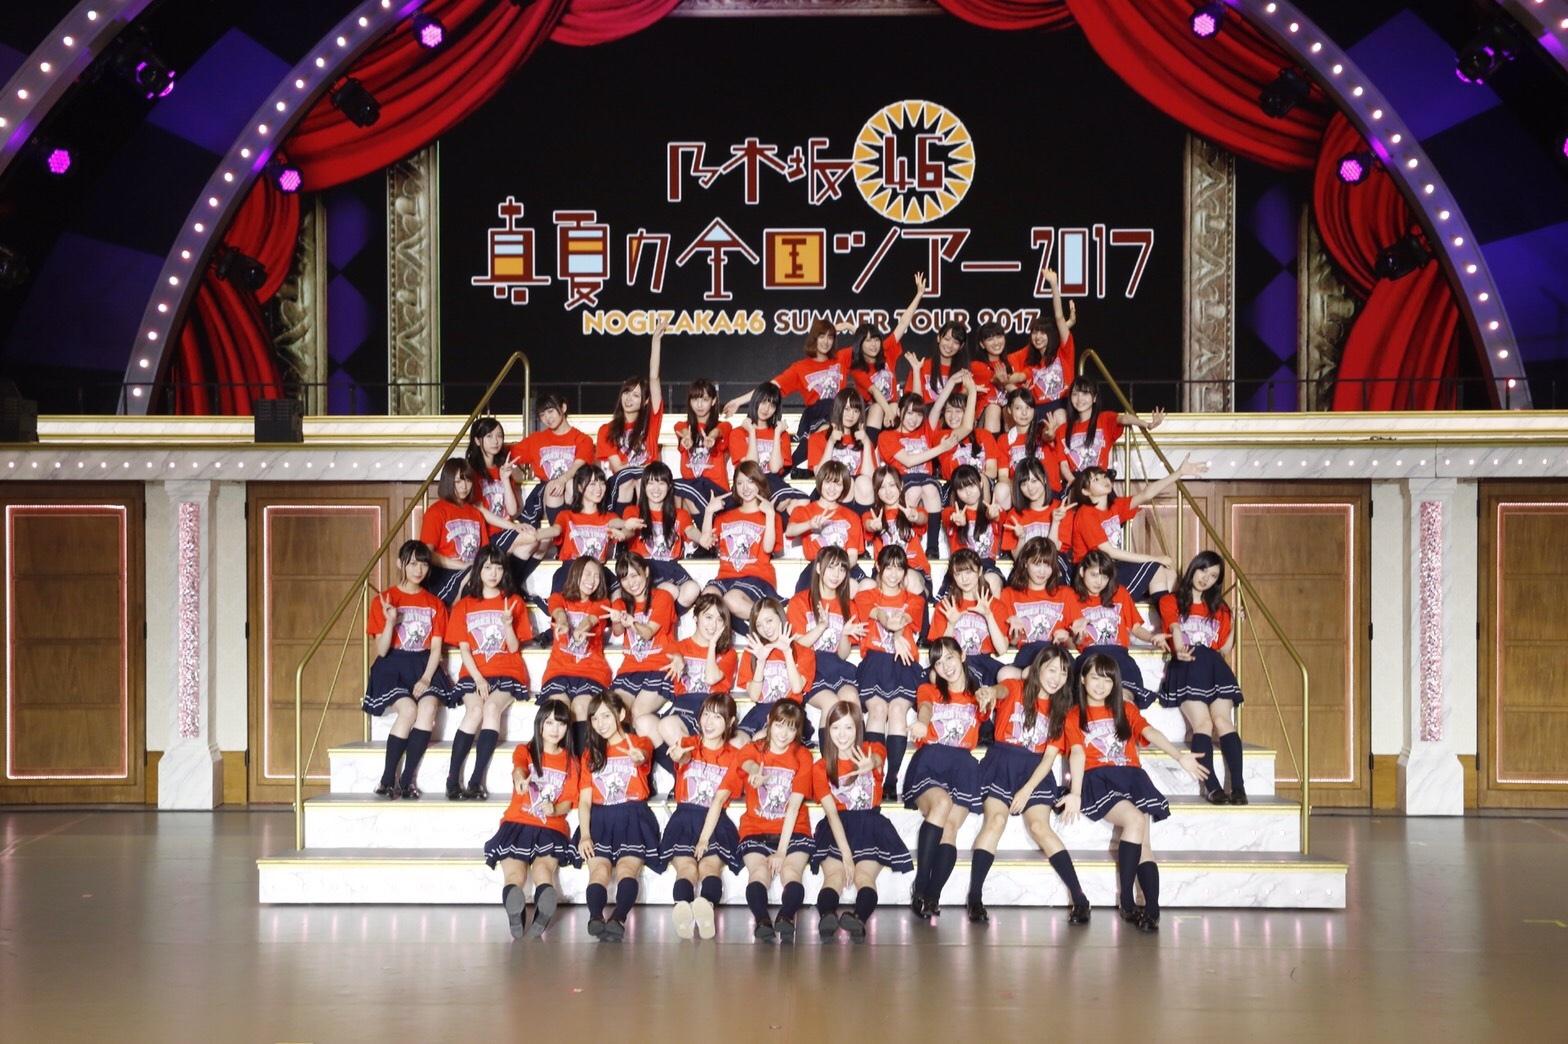 乃木坂46「真夏の全国ツアー2017」集合写真 仙台